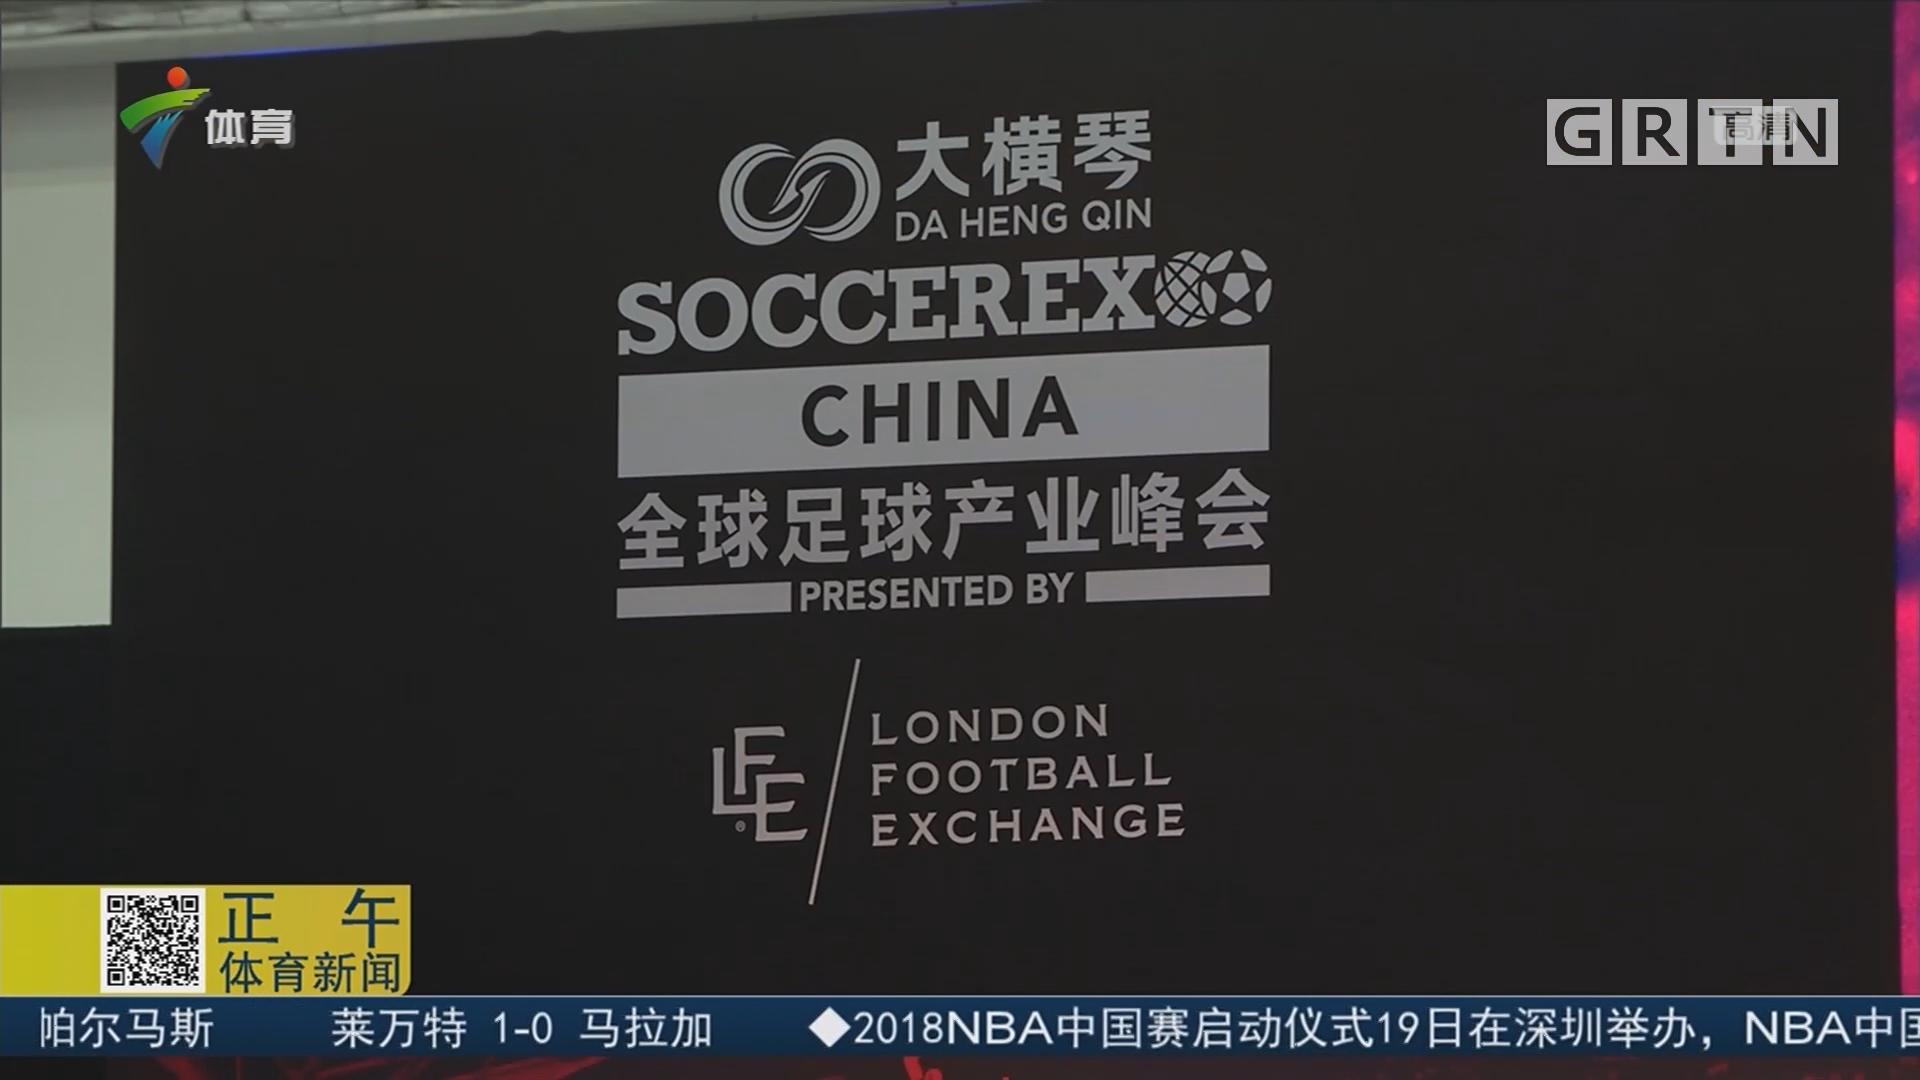 SOCOEREX全球足球产业峰会——高科技的体验